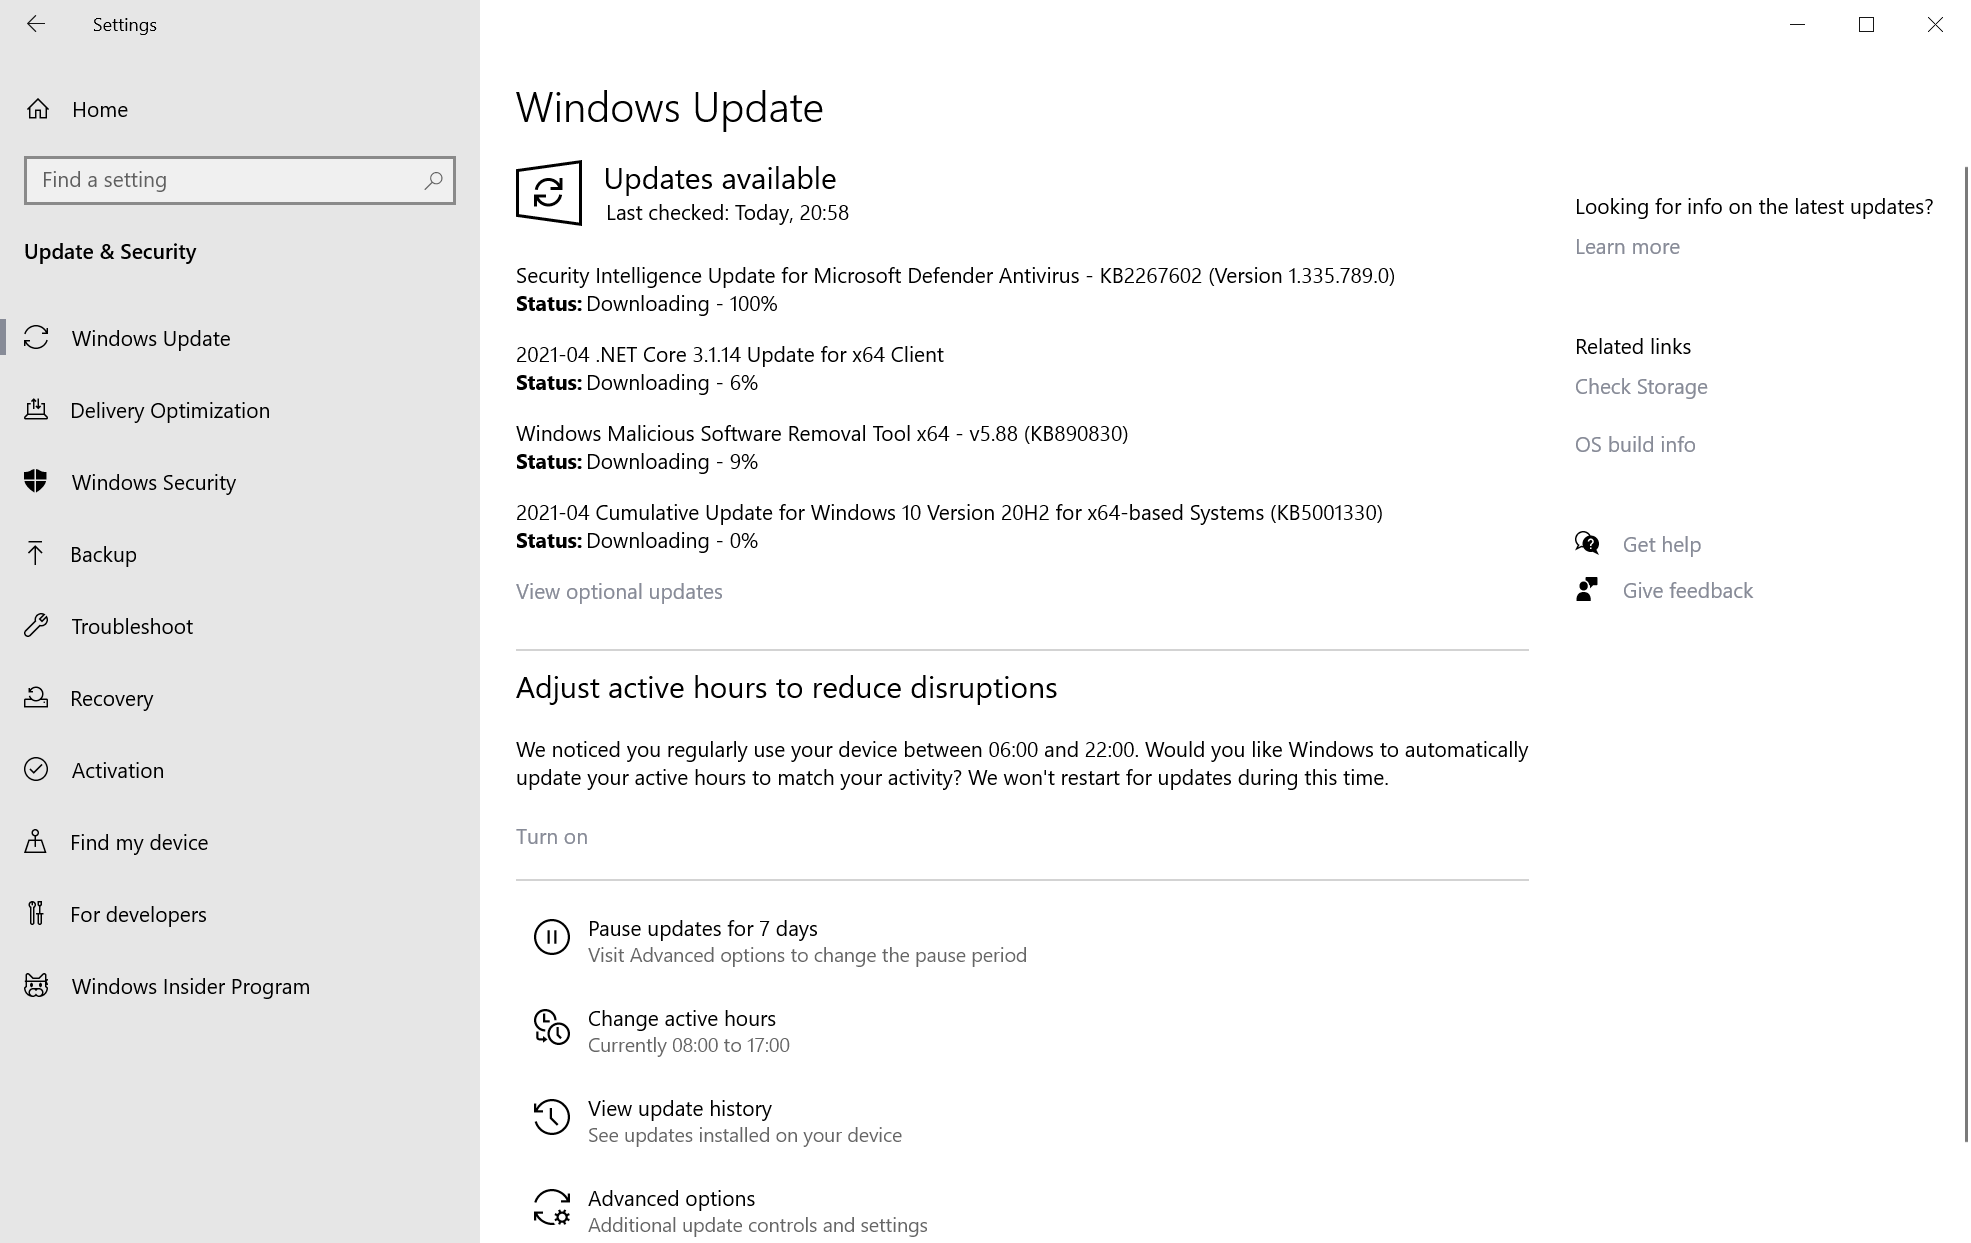 Microsoft Windows Security Updates April 2021 overview microsoft-windows-security-updates-april-2021.png